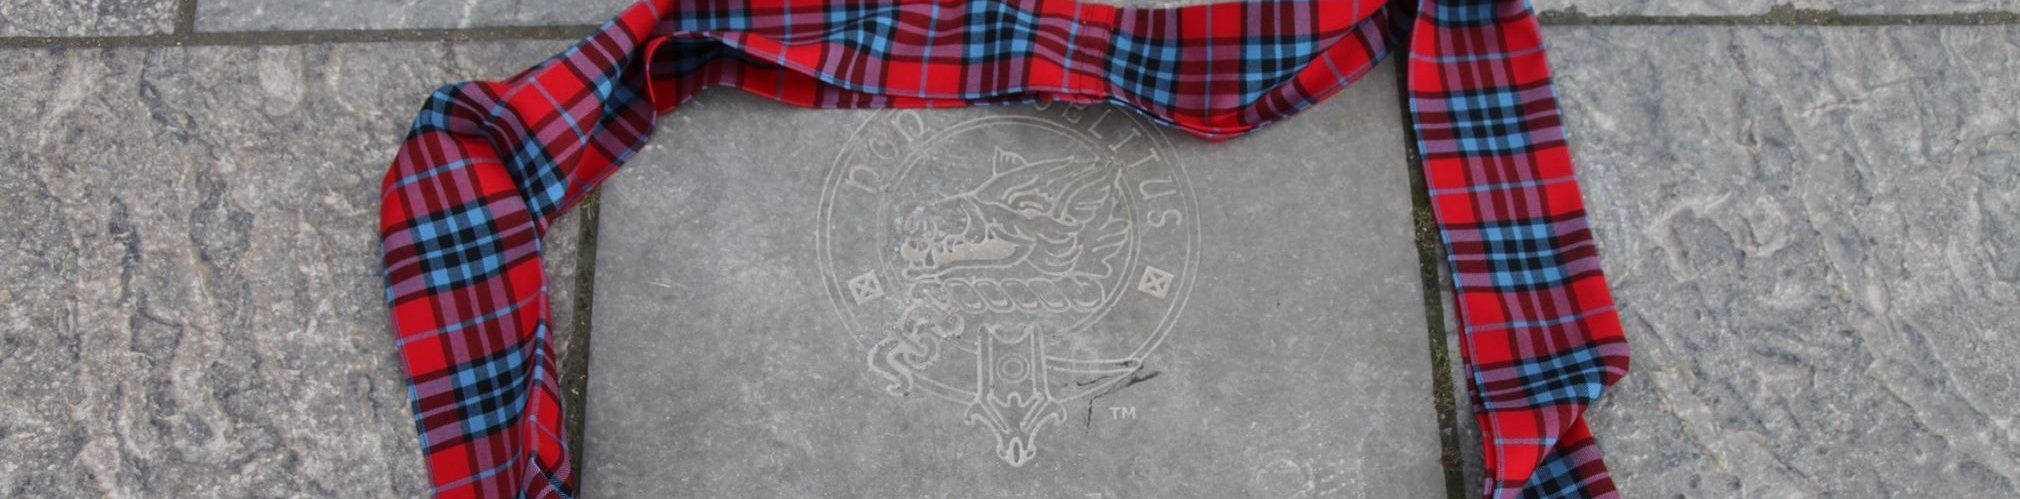 Clan MacTavish (Thompson) or (Thomson) an ancient Scottish Highland Clan Official website banner